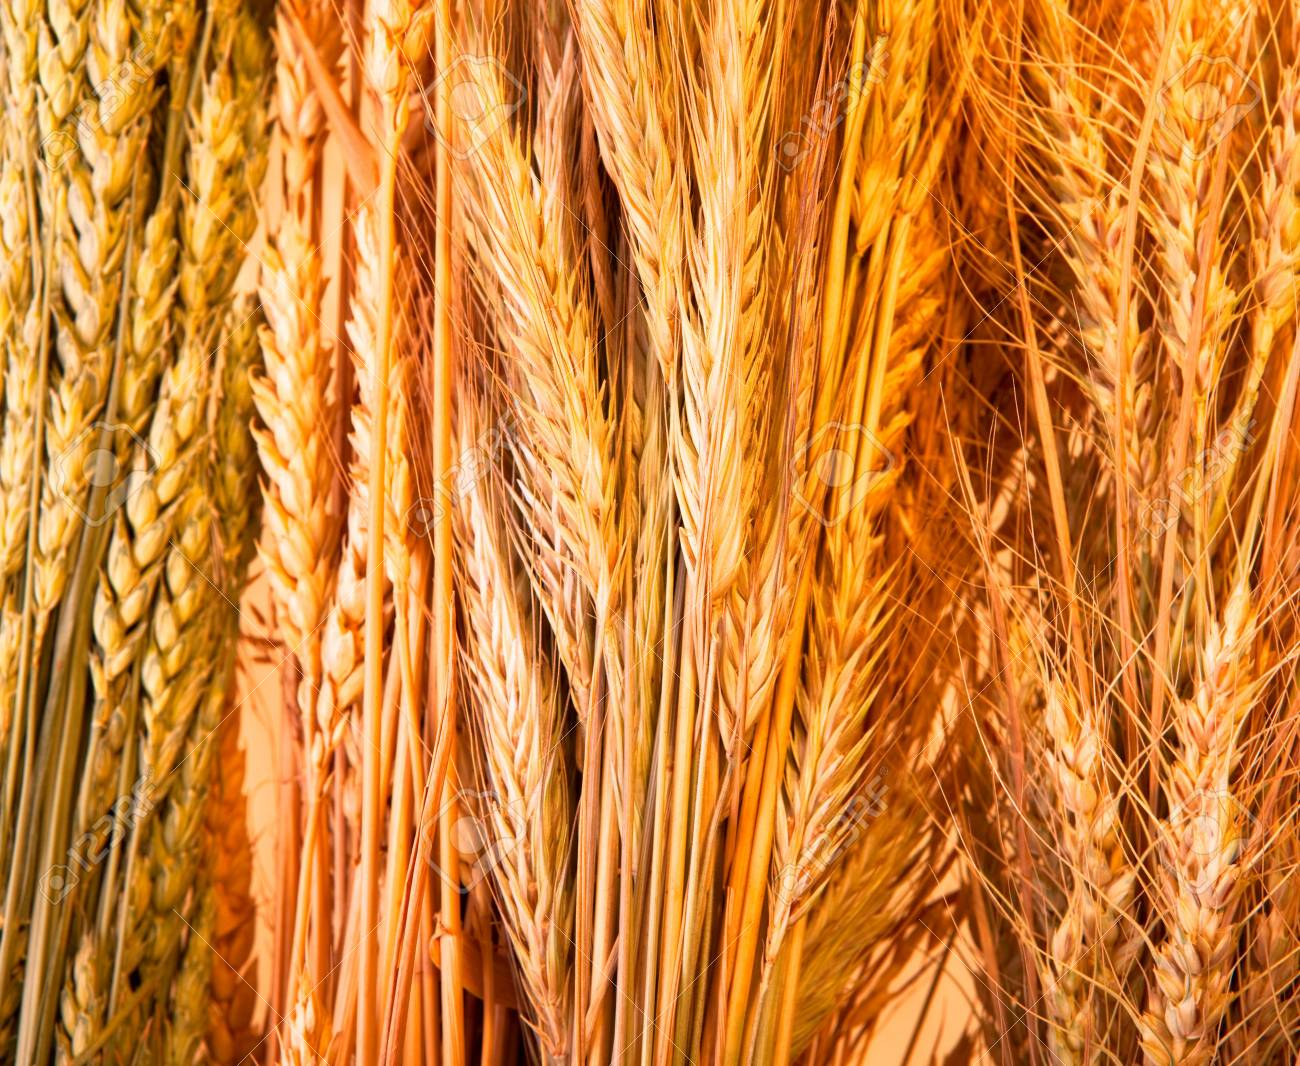 Golden wheat background Stock Photo - 5375394